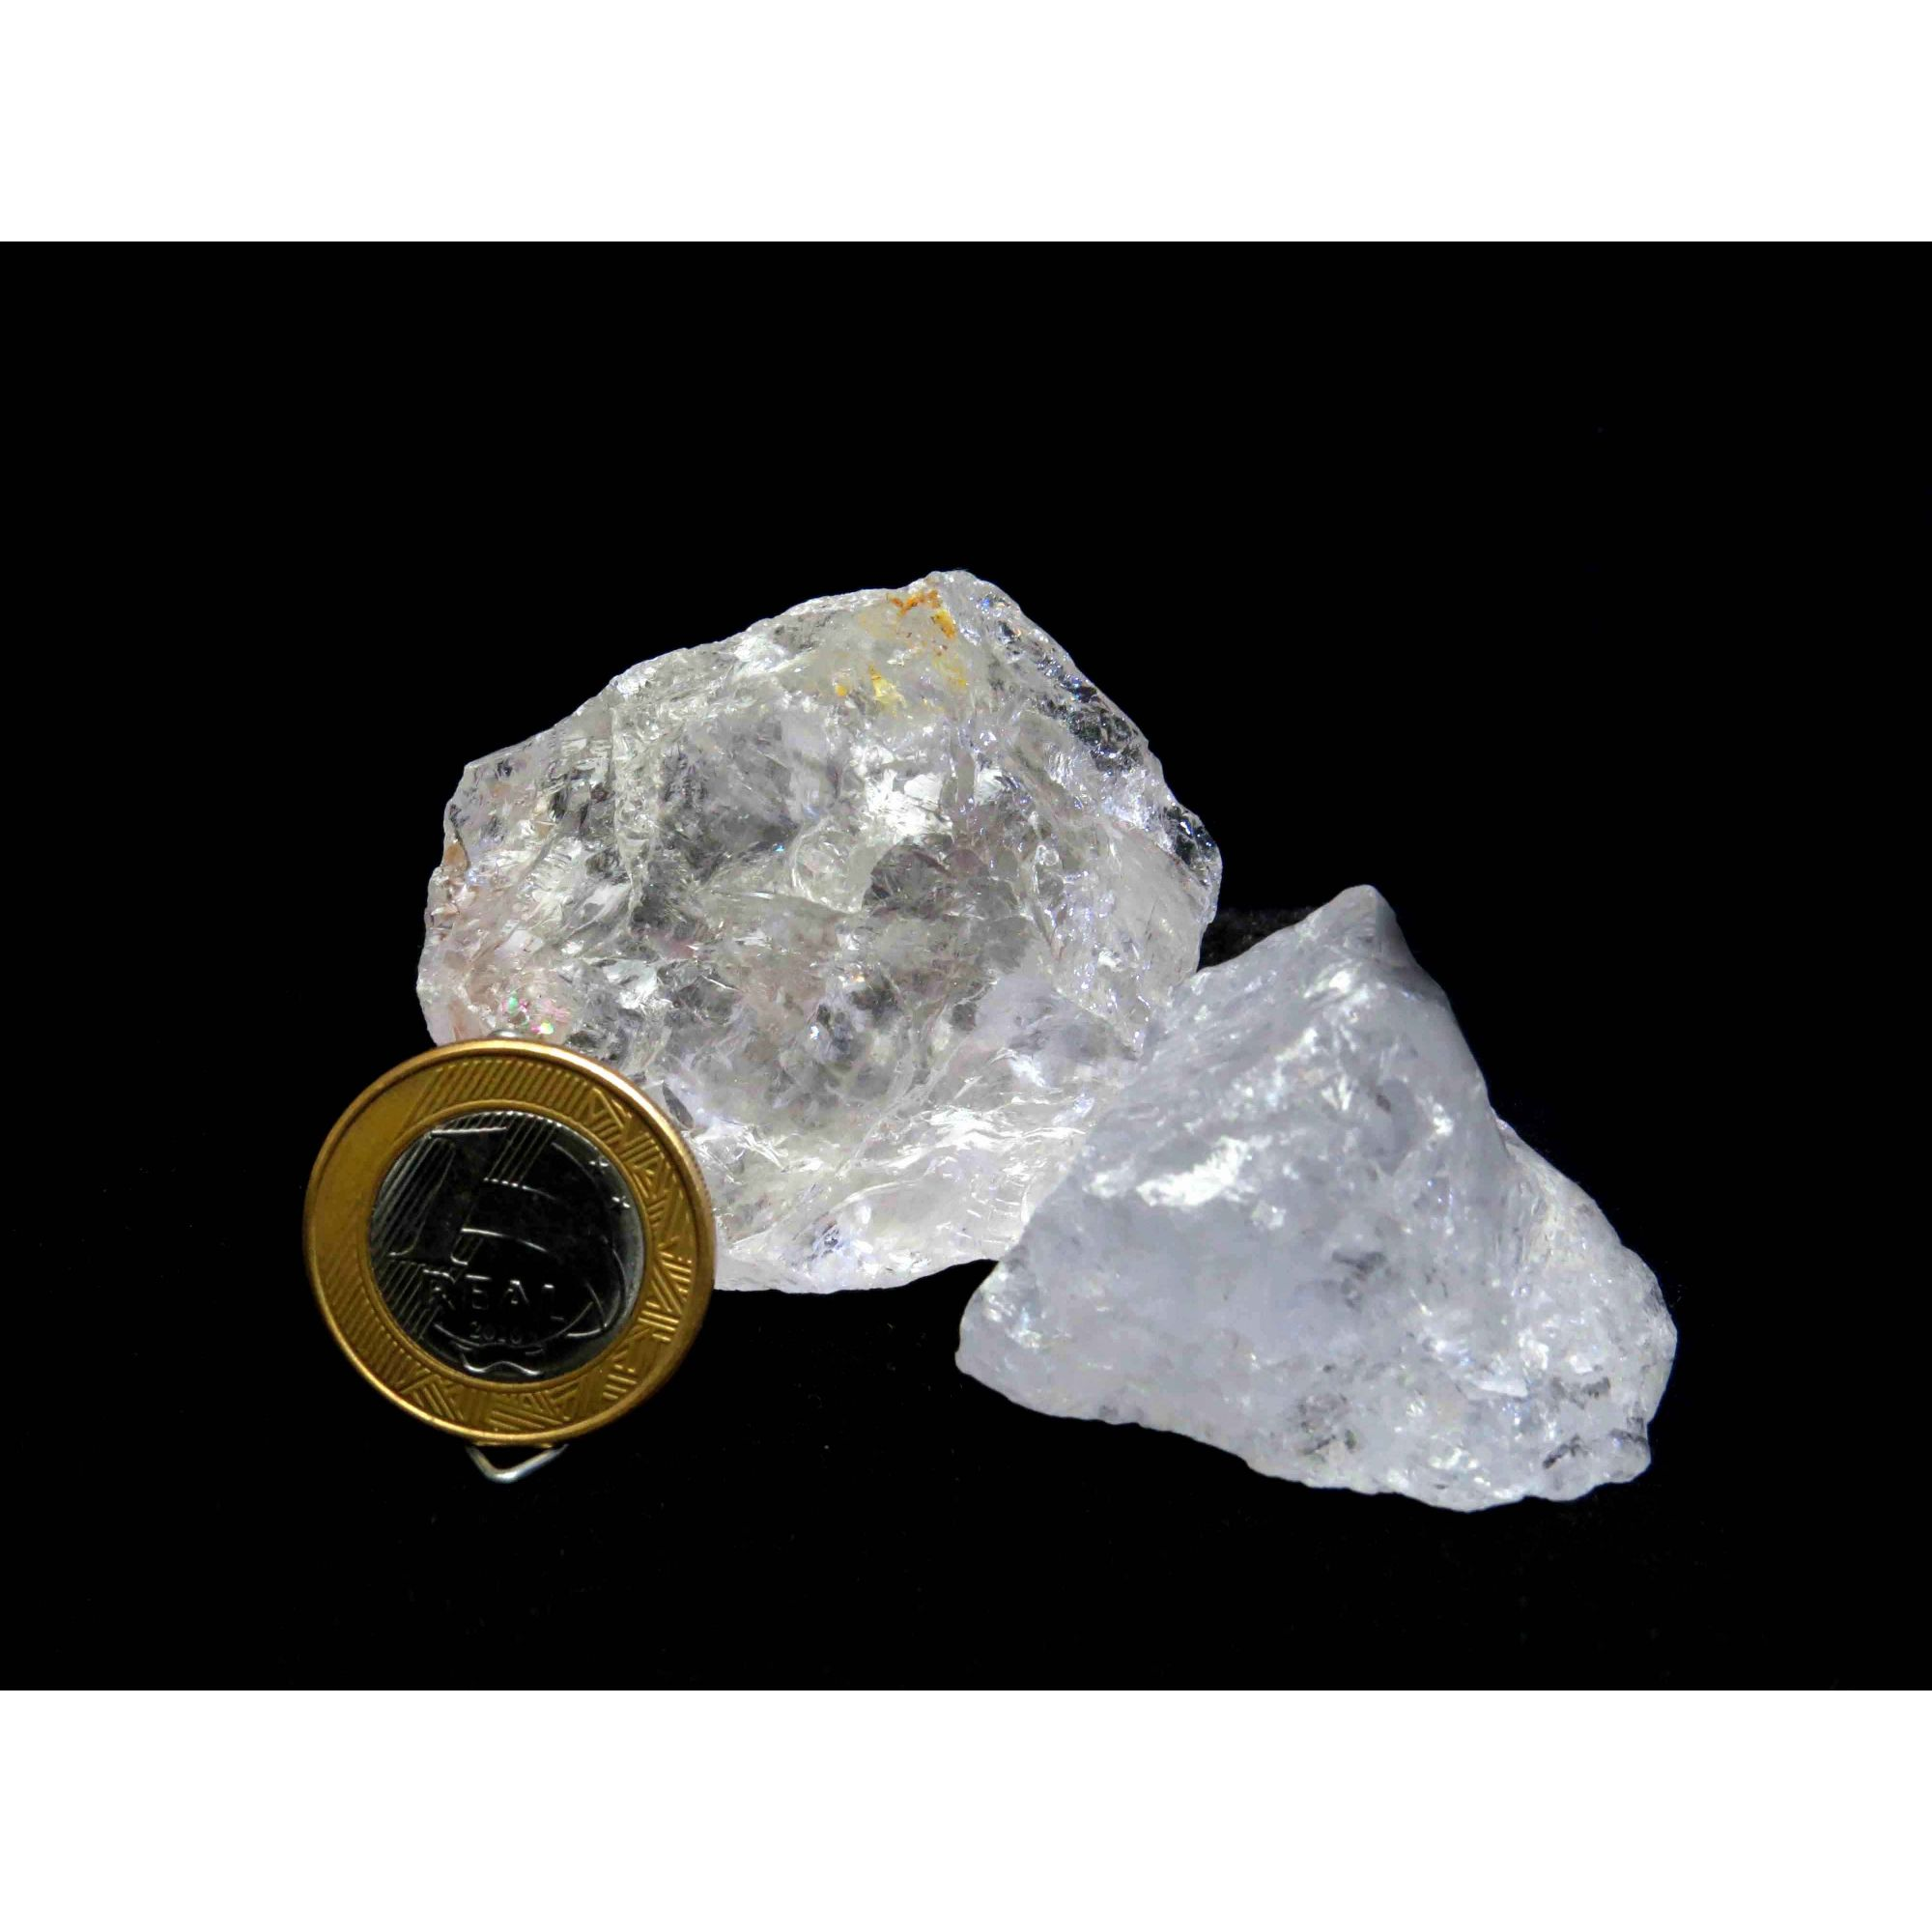 Cristal de Quartzo - Bruto